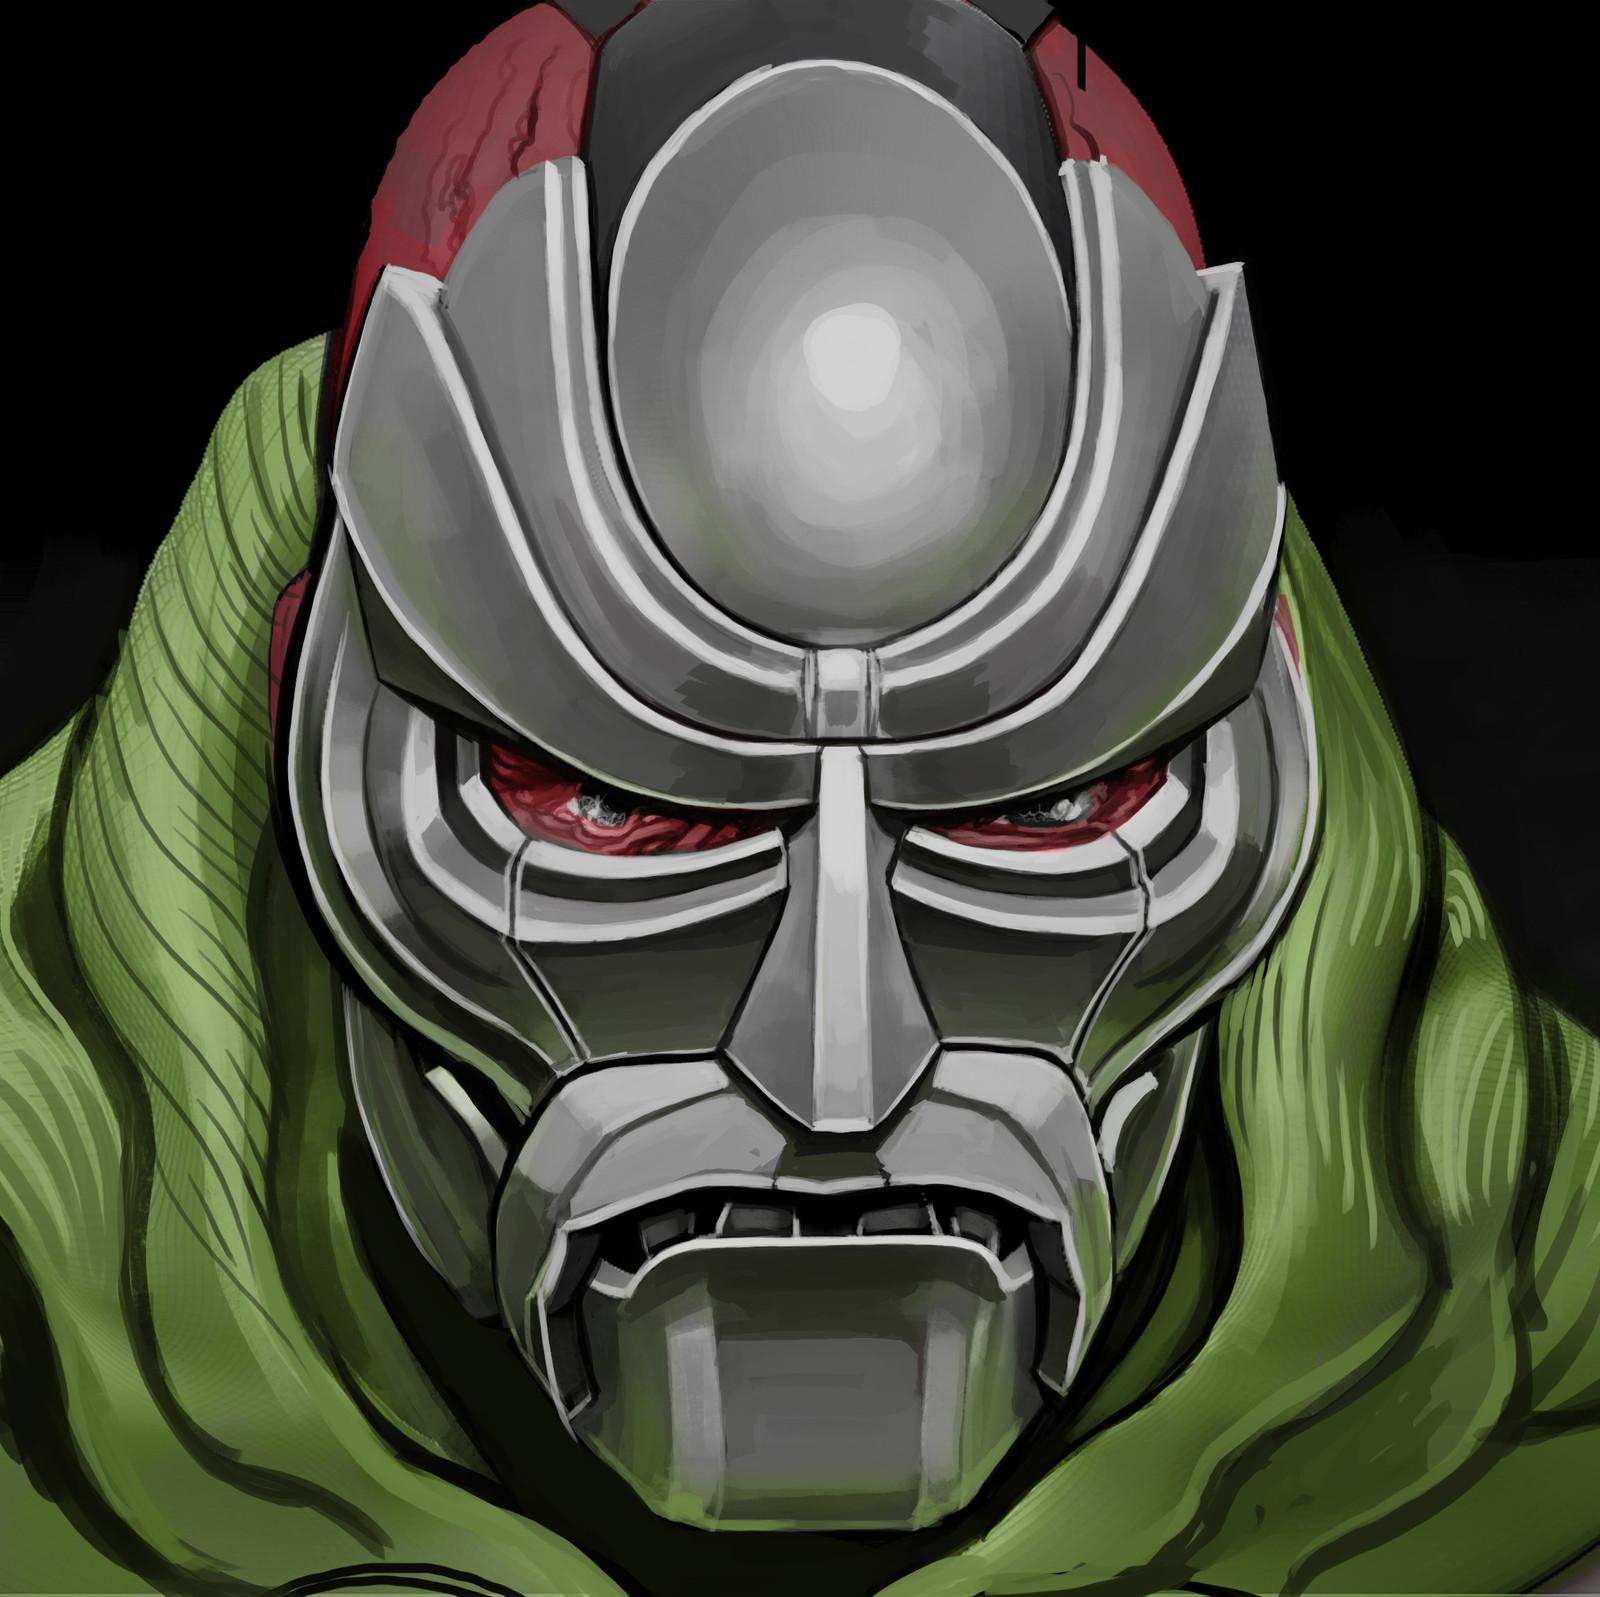 Dr Doom!